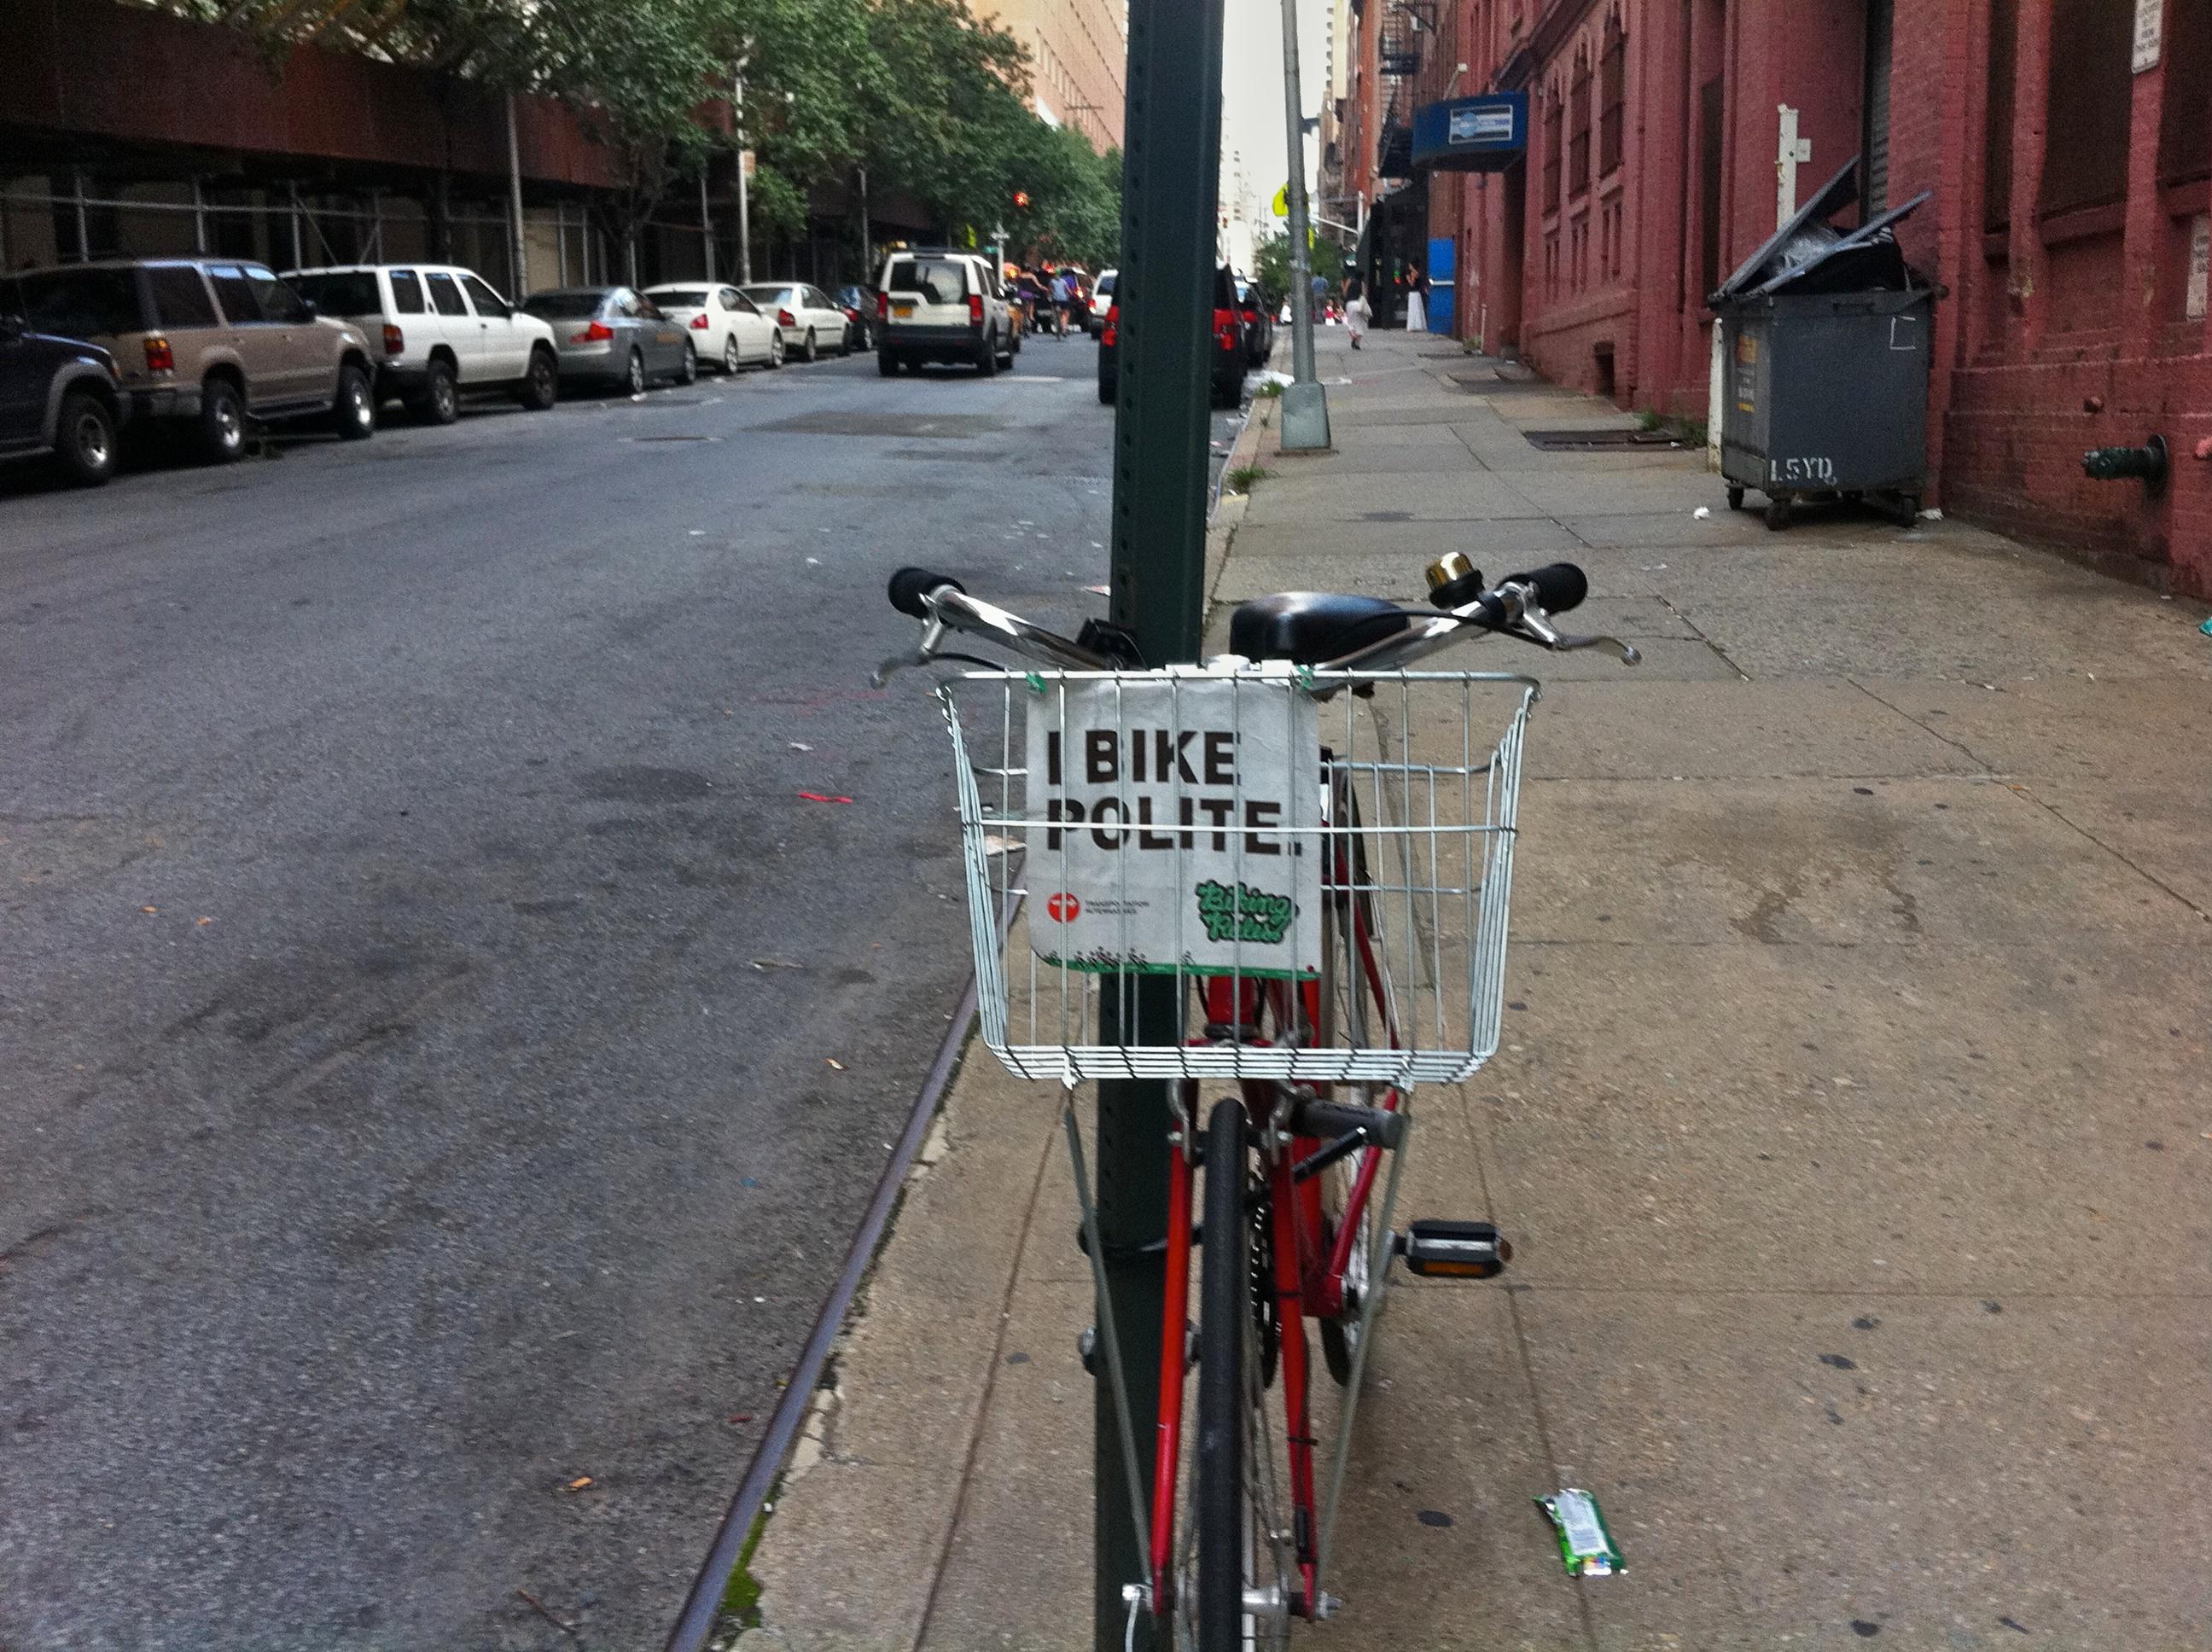 Day 242 - I Bike Polite